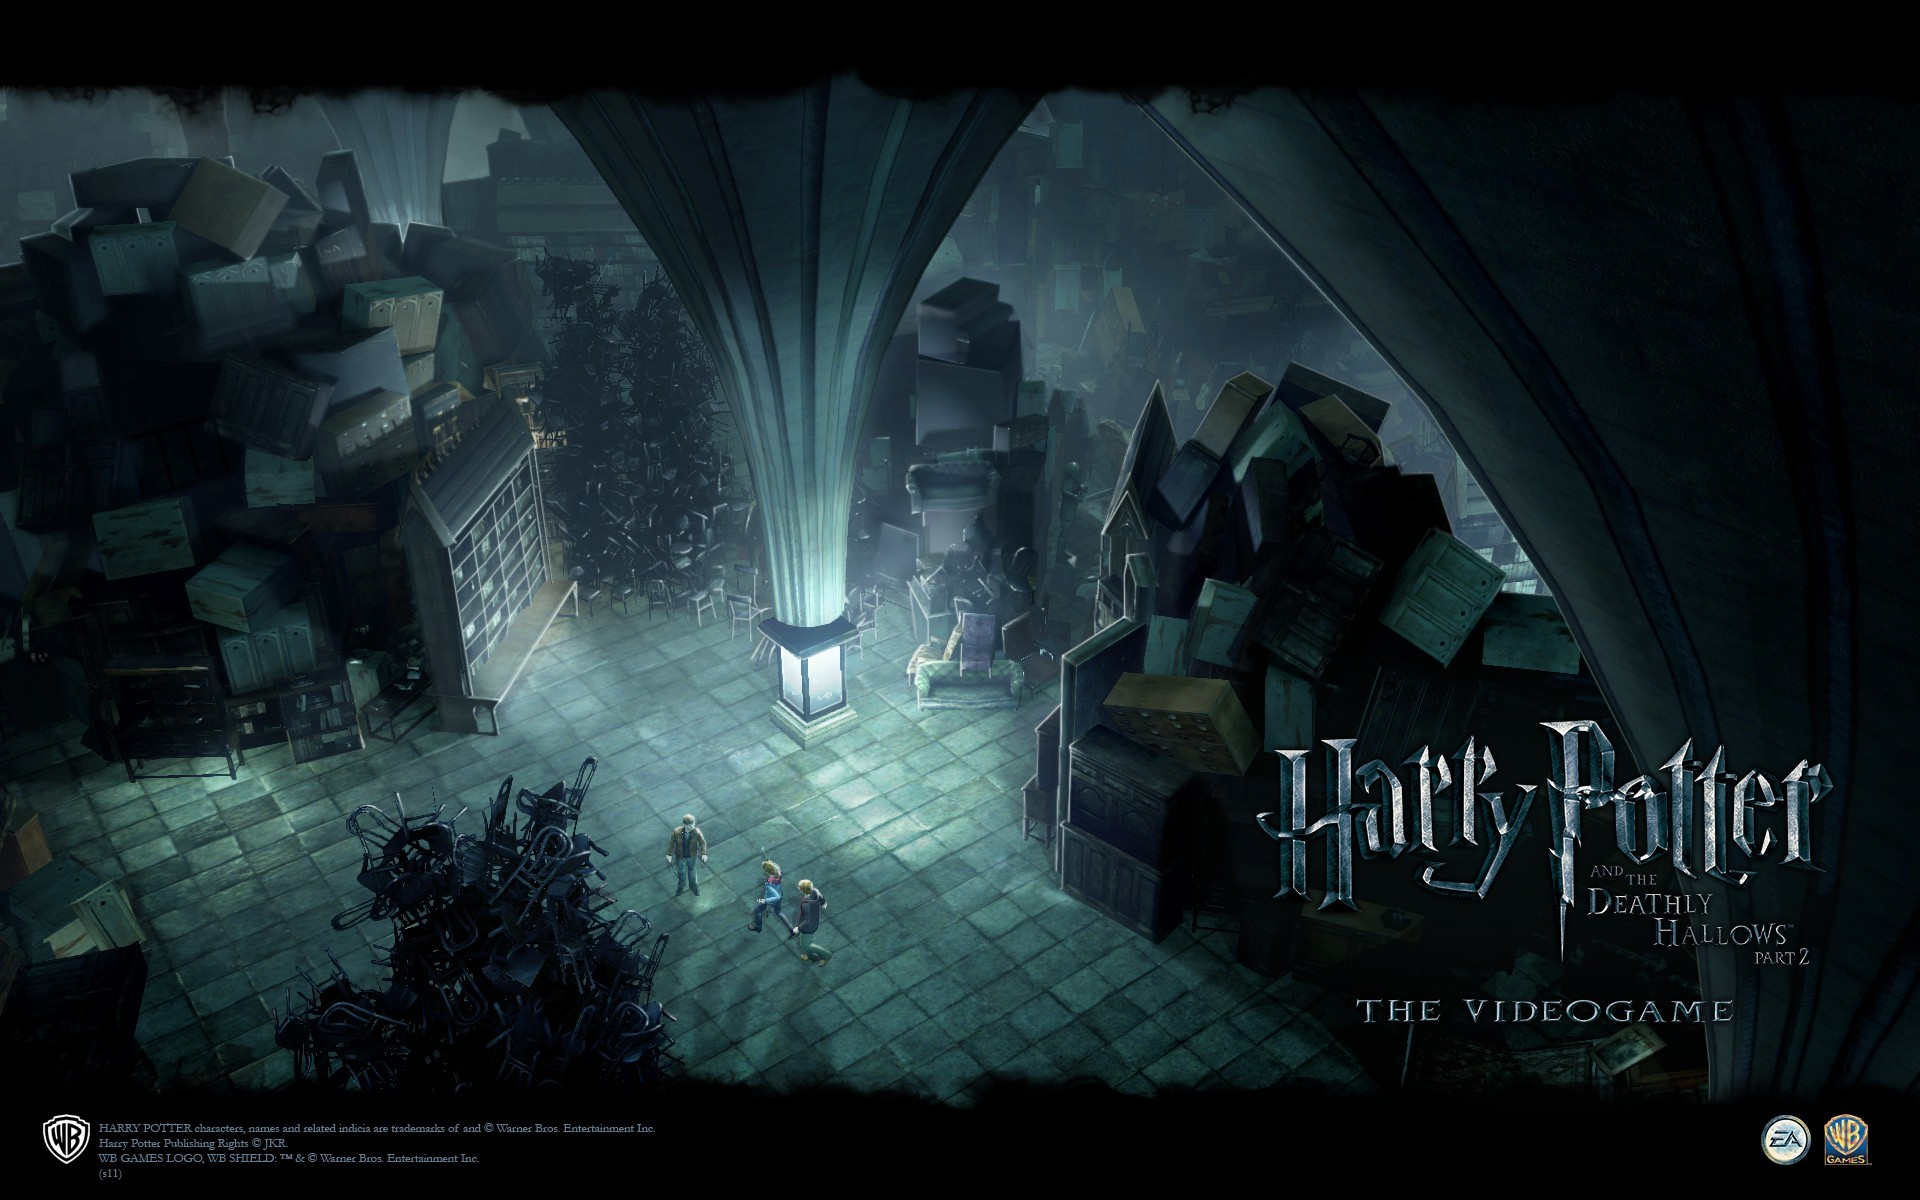 Fall Wallpaper 16 9 1080p Harry Potter Wallpaper 82 Images